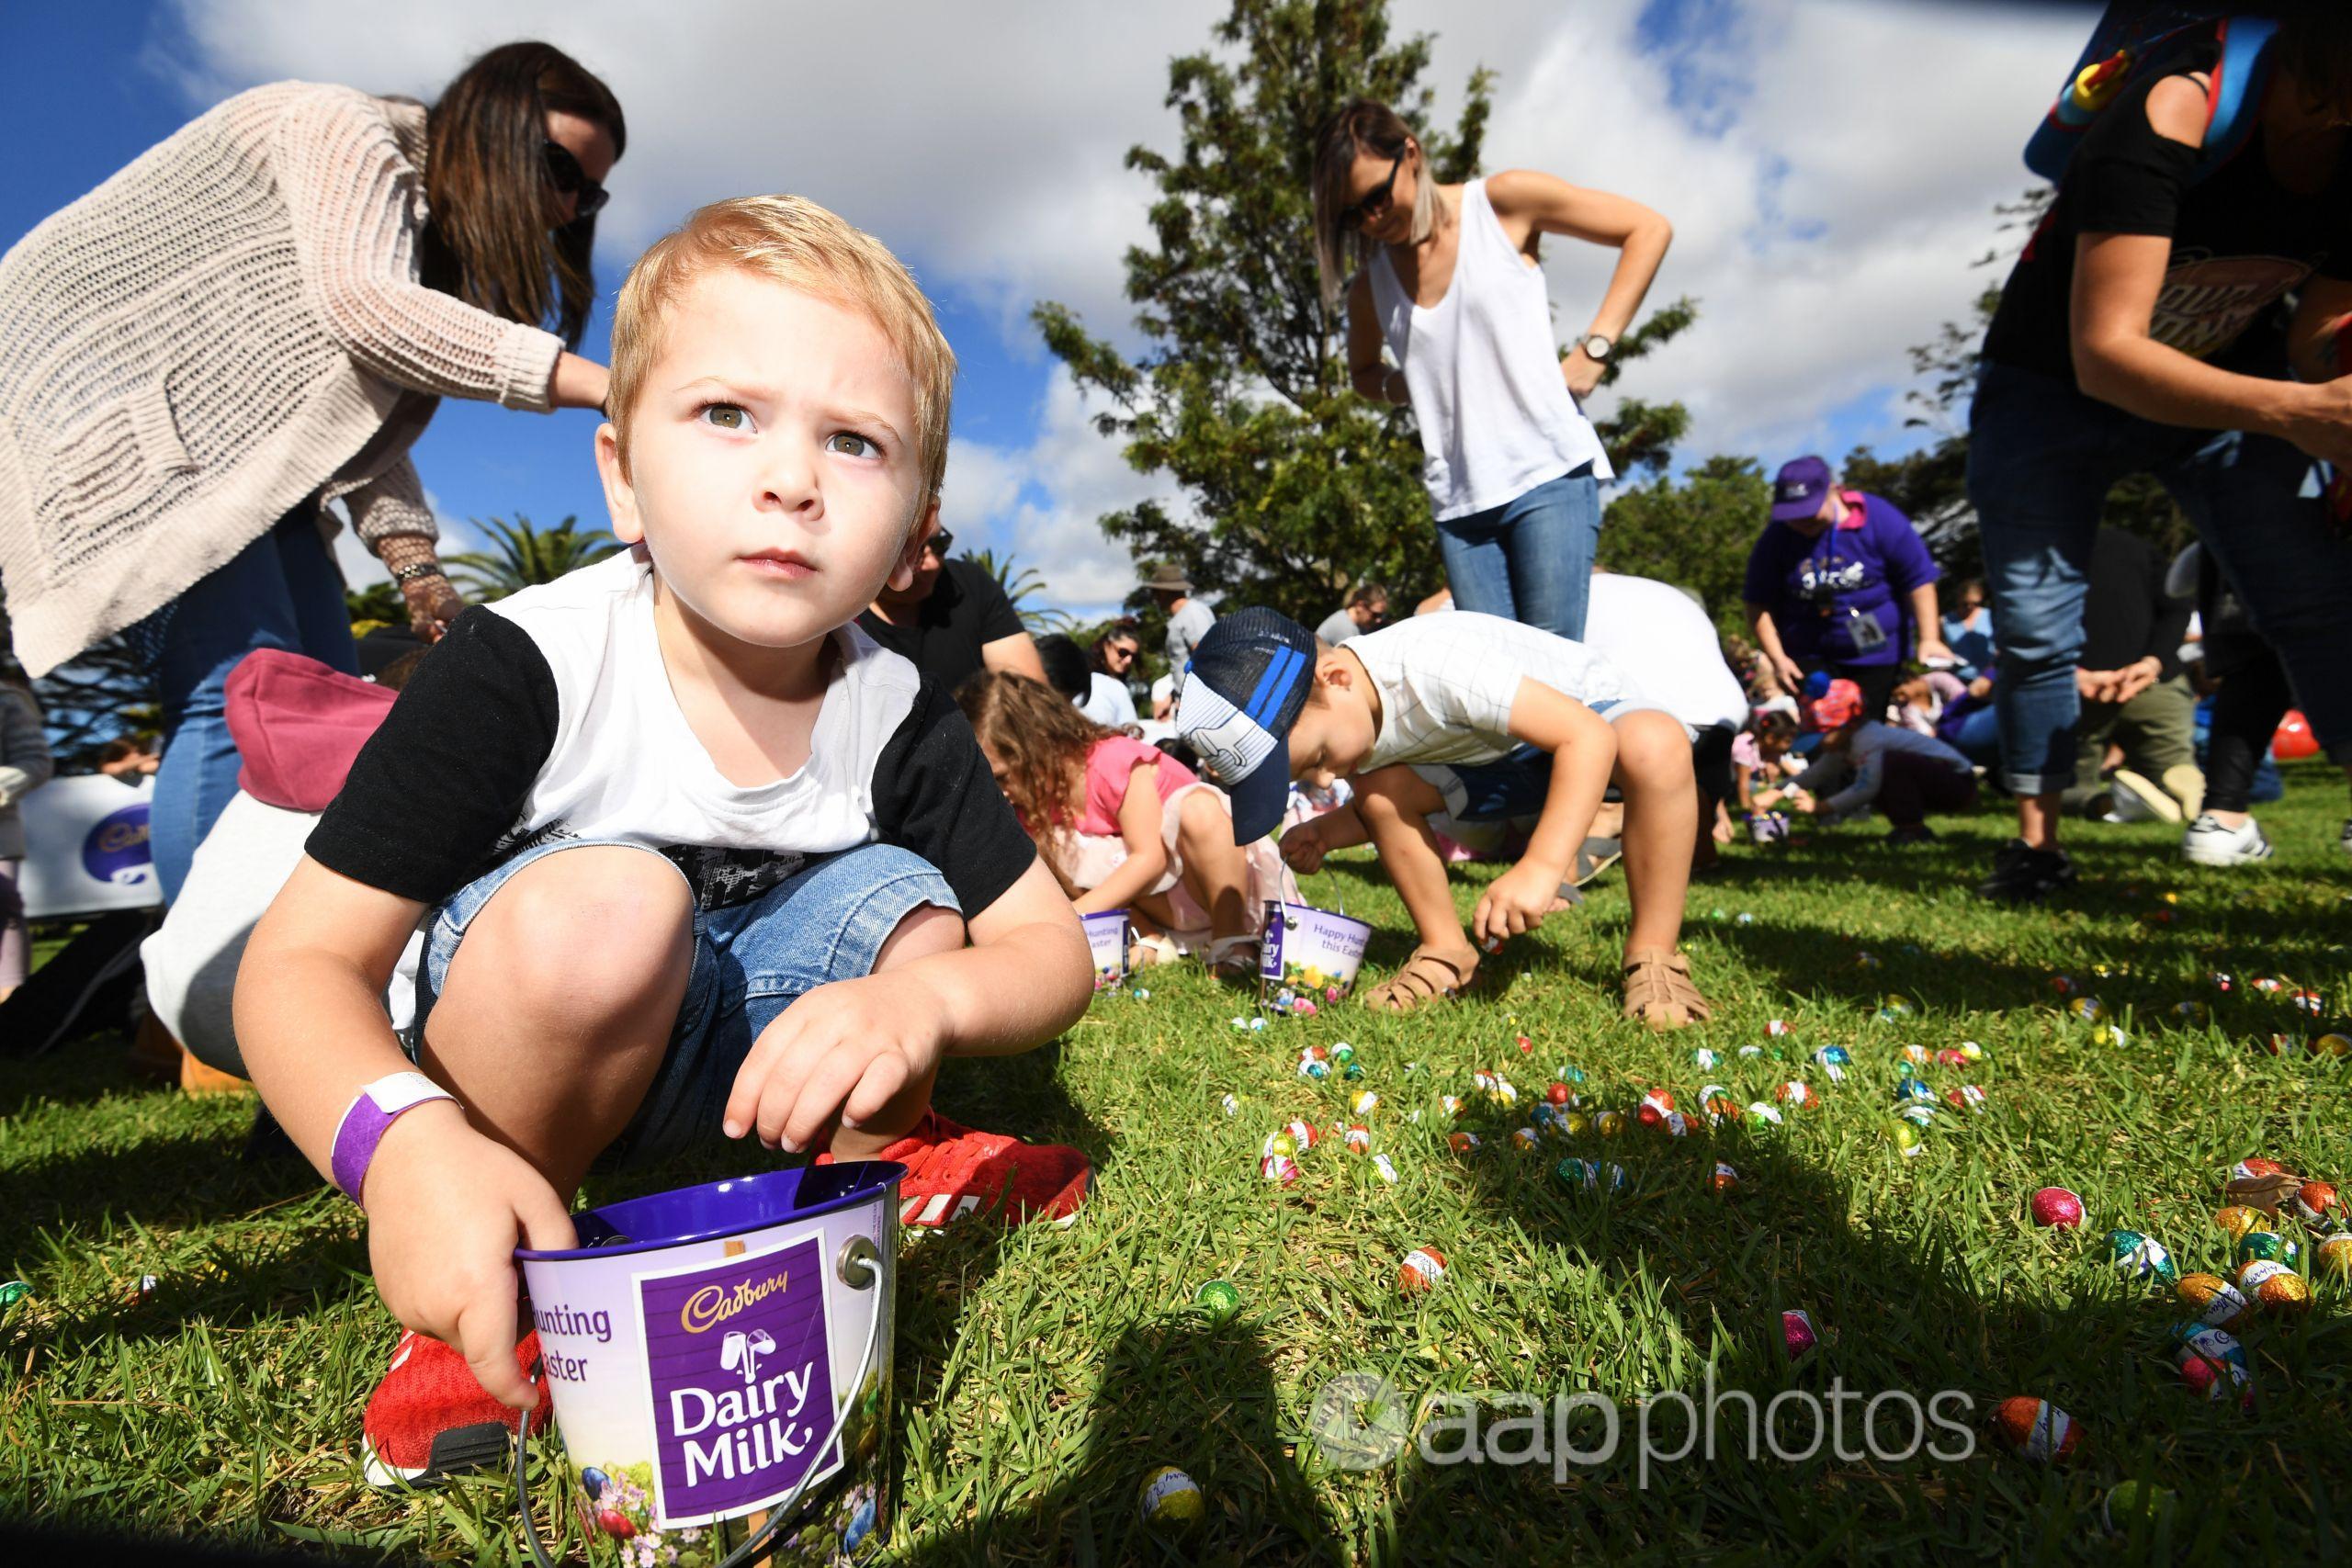 Children collect chocolate eggs